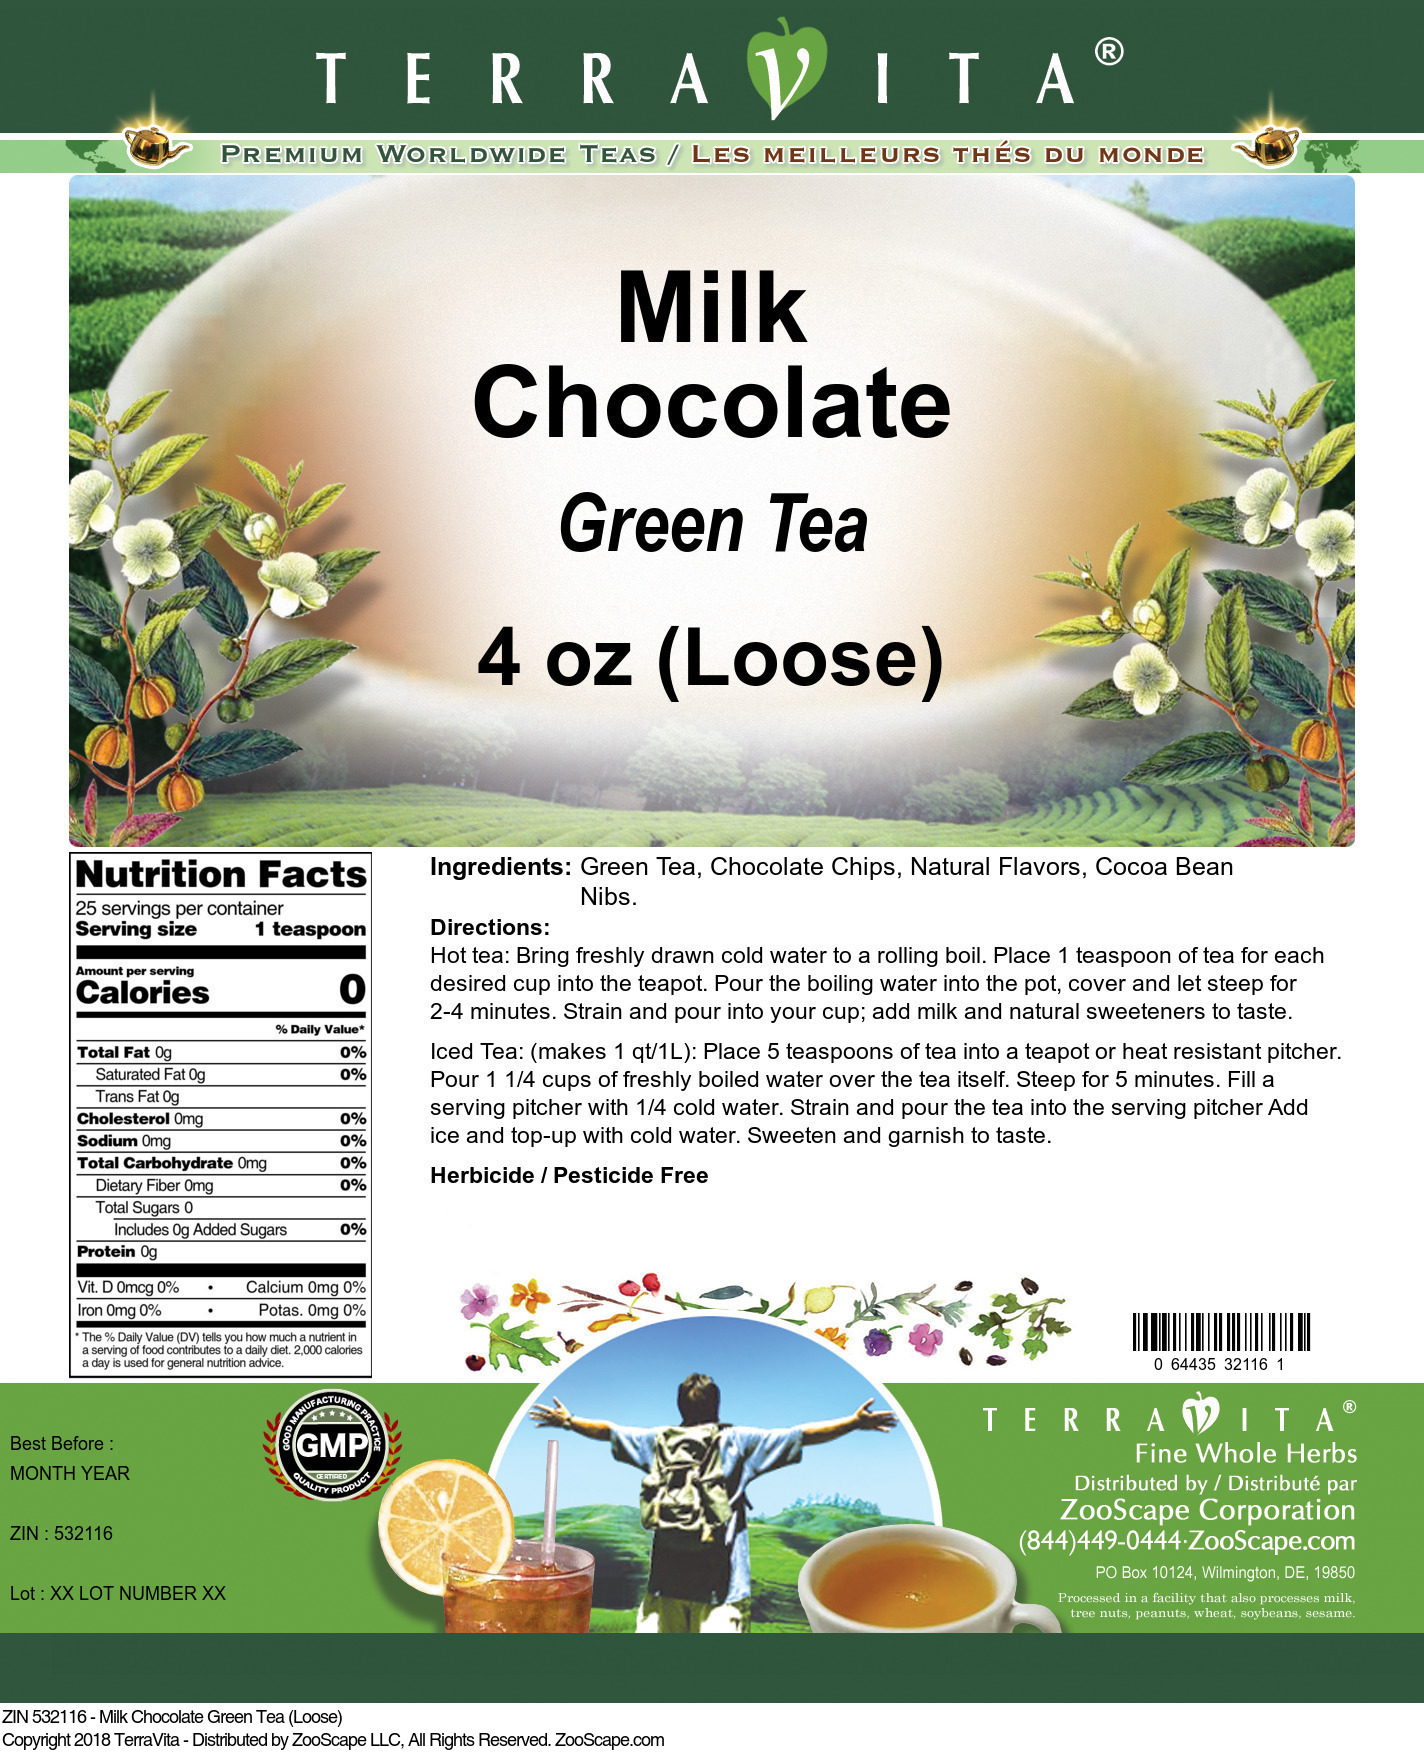 Milk Chocolate Green Tea (Loose)